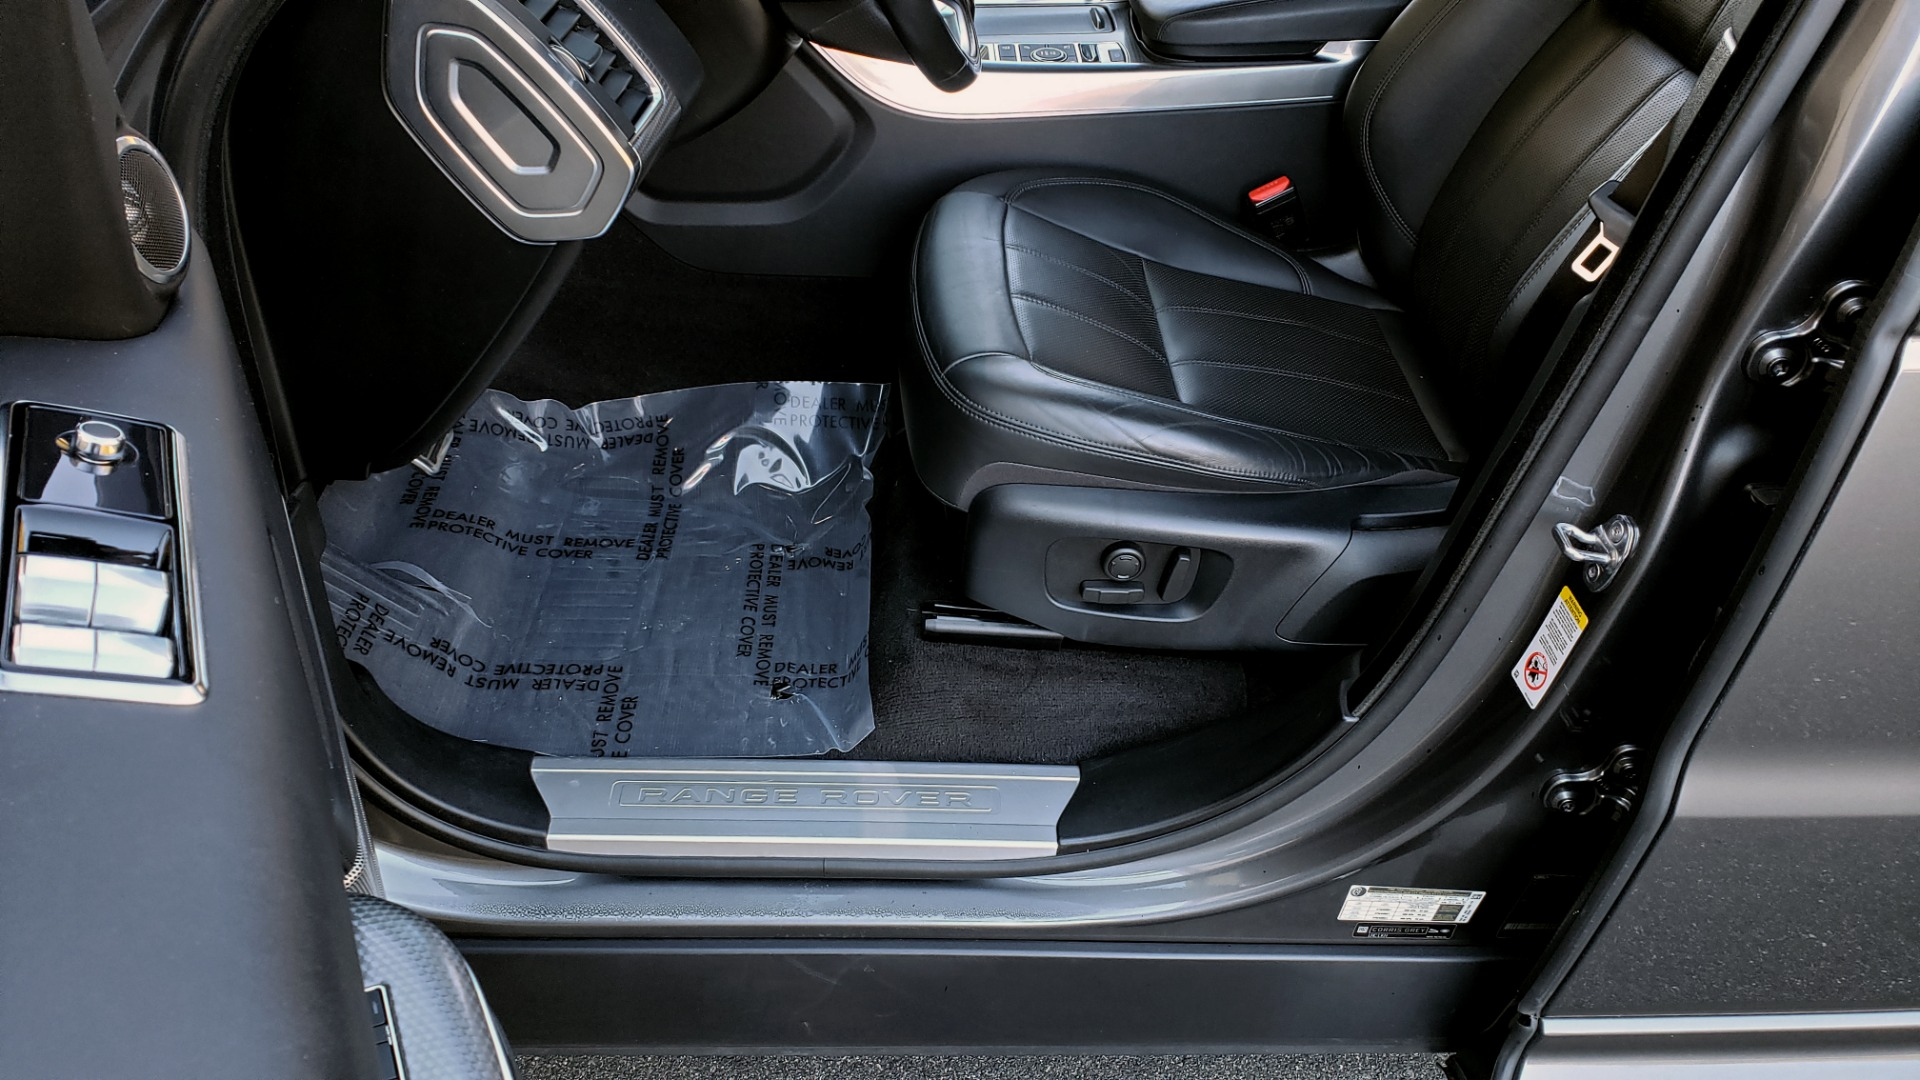 Used 2018 Land Rover RANGE ROVER SPORT DYNAMIC SC V8 / CLIMATE CMFRT / VISION ASST / MERIDIAN for sale Sold at Formula Imports in Charlotte NC 28227 43